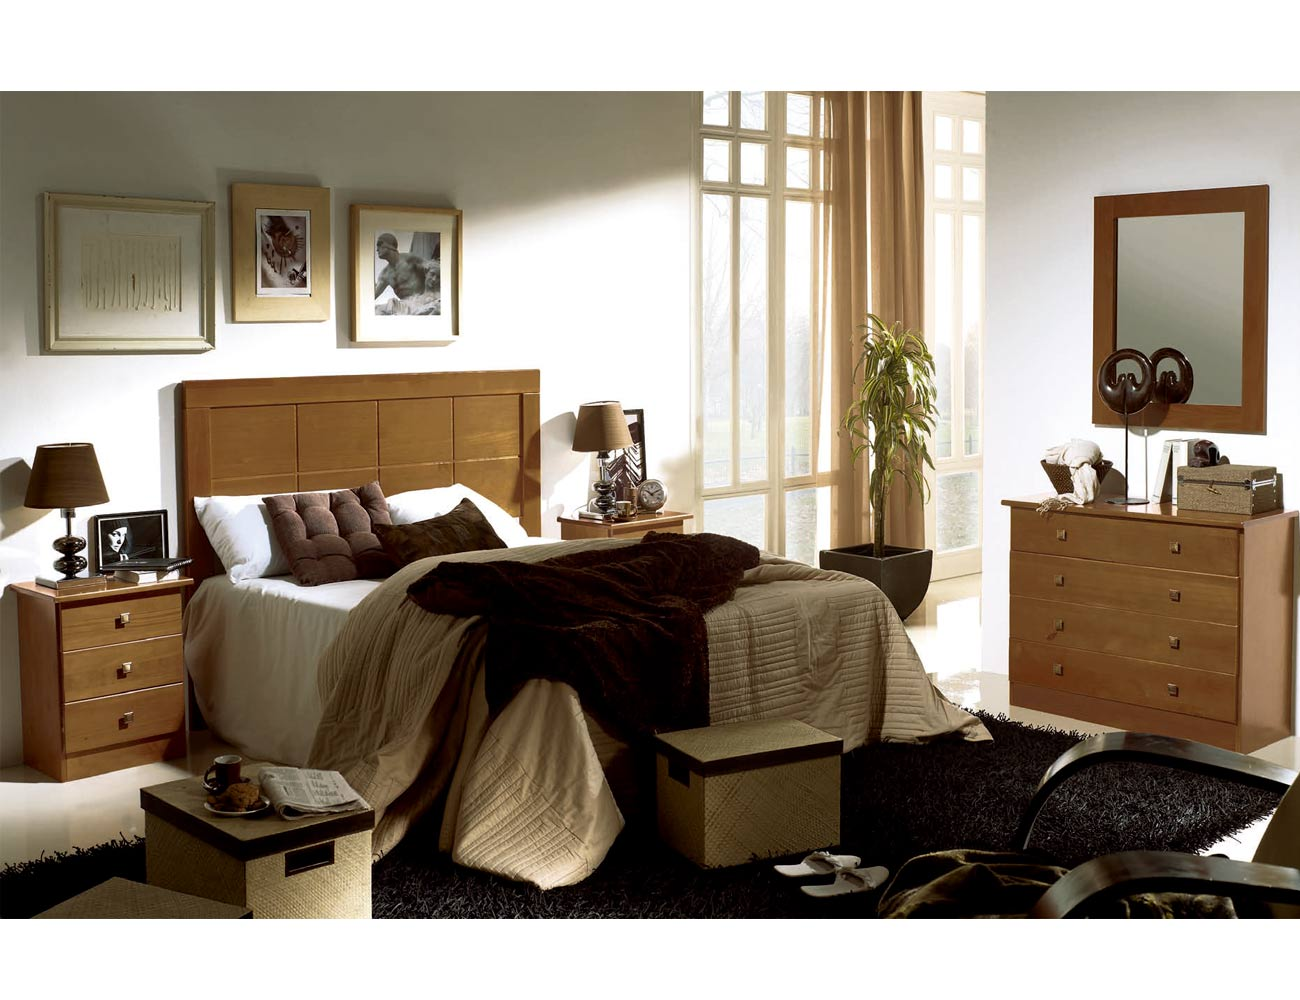 Dormitorio matrimonio kenia madera nogal